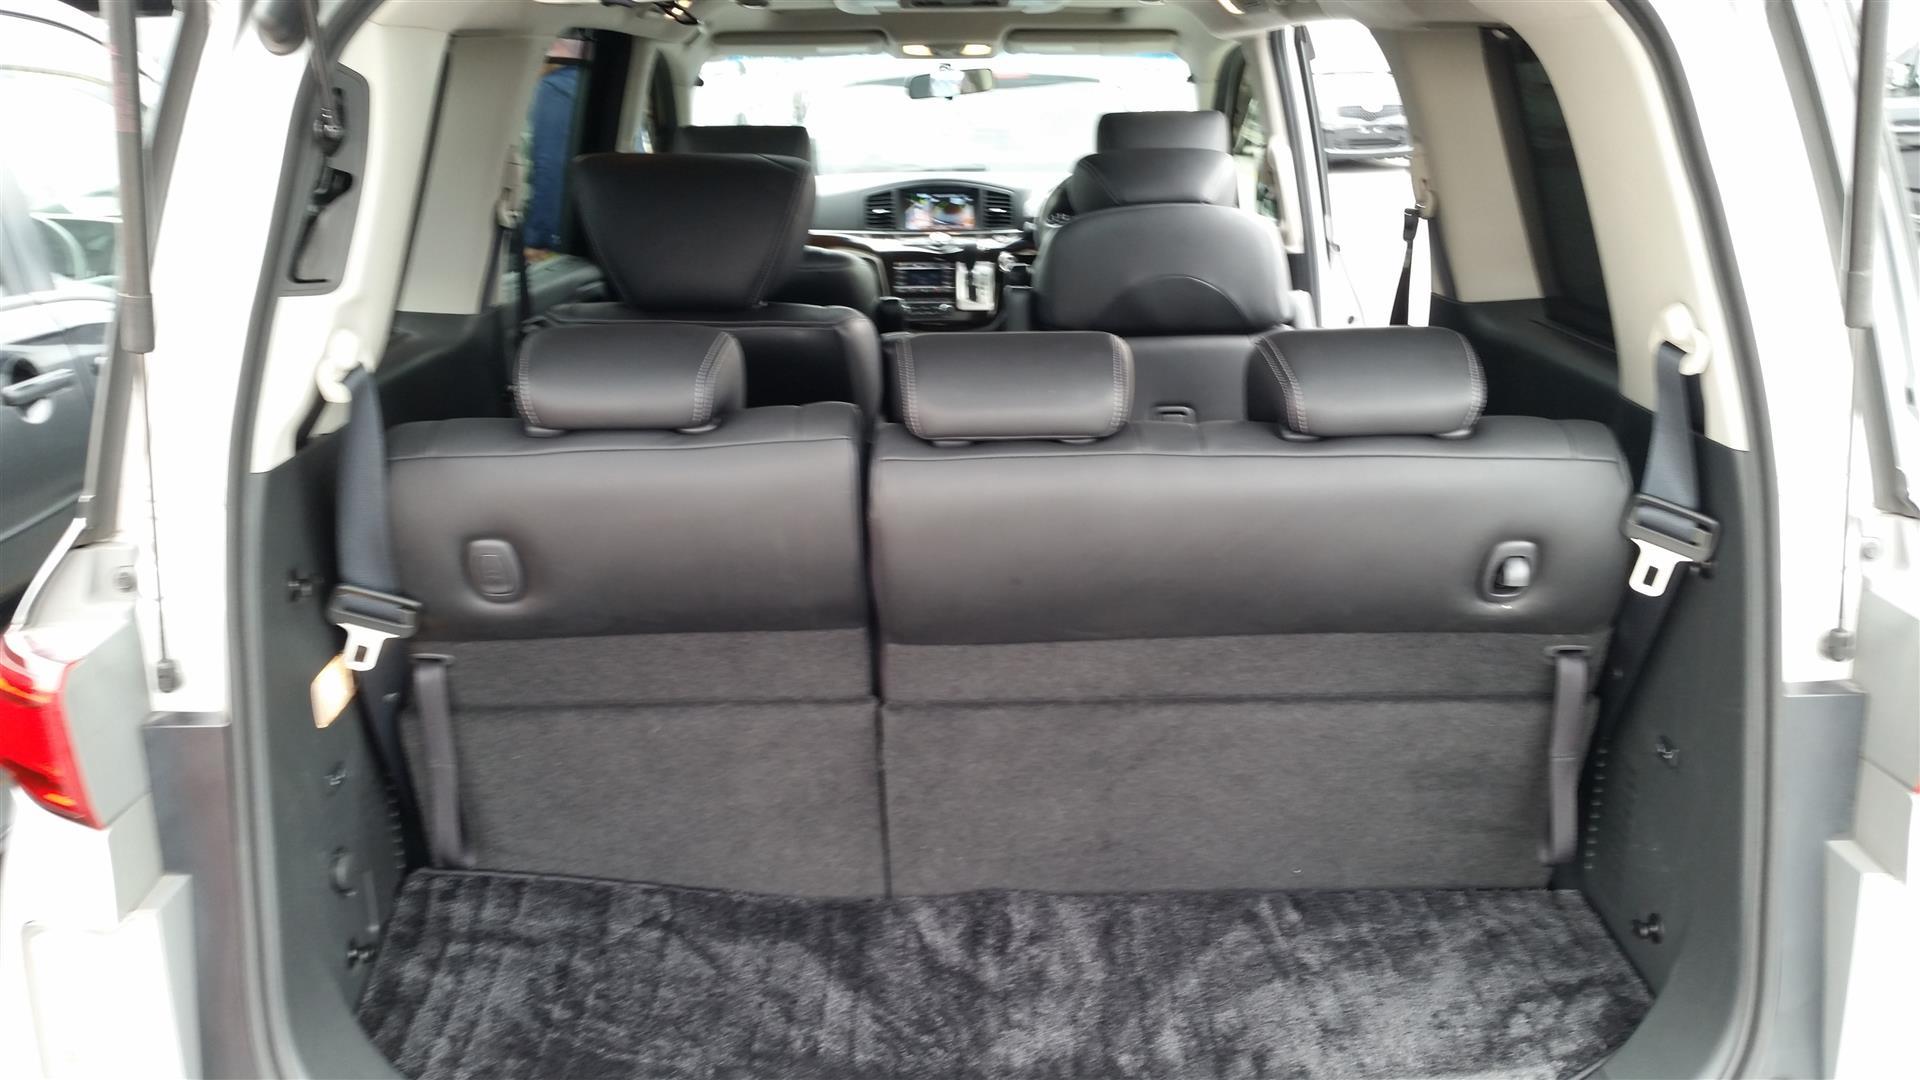 2012 Nissan Elgrand E52 20150627_143806 (Large)